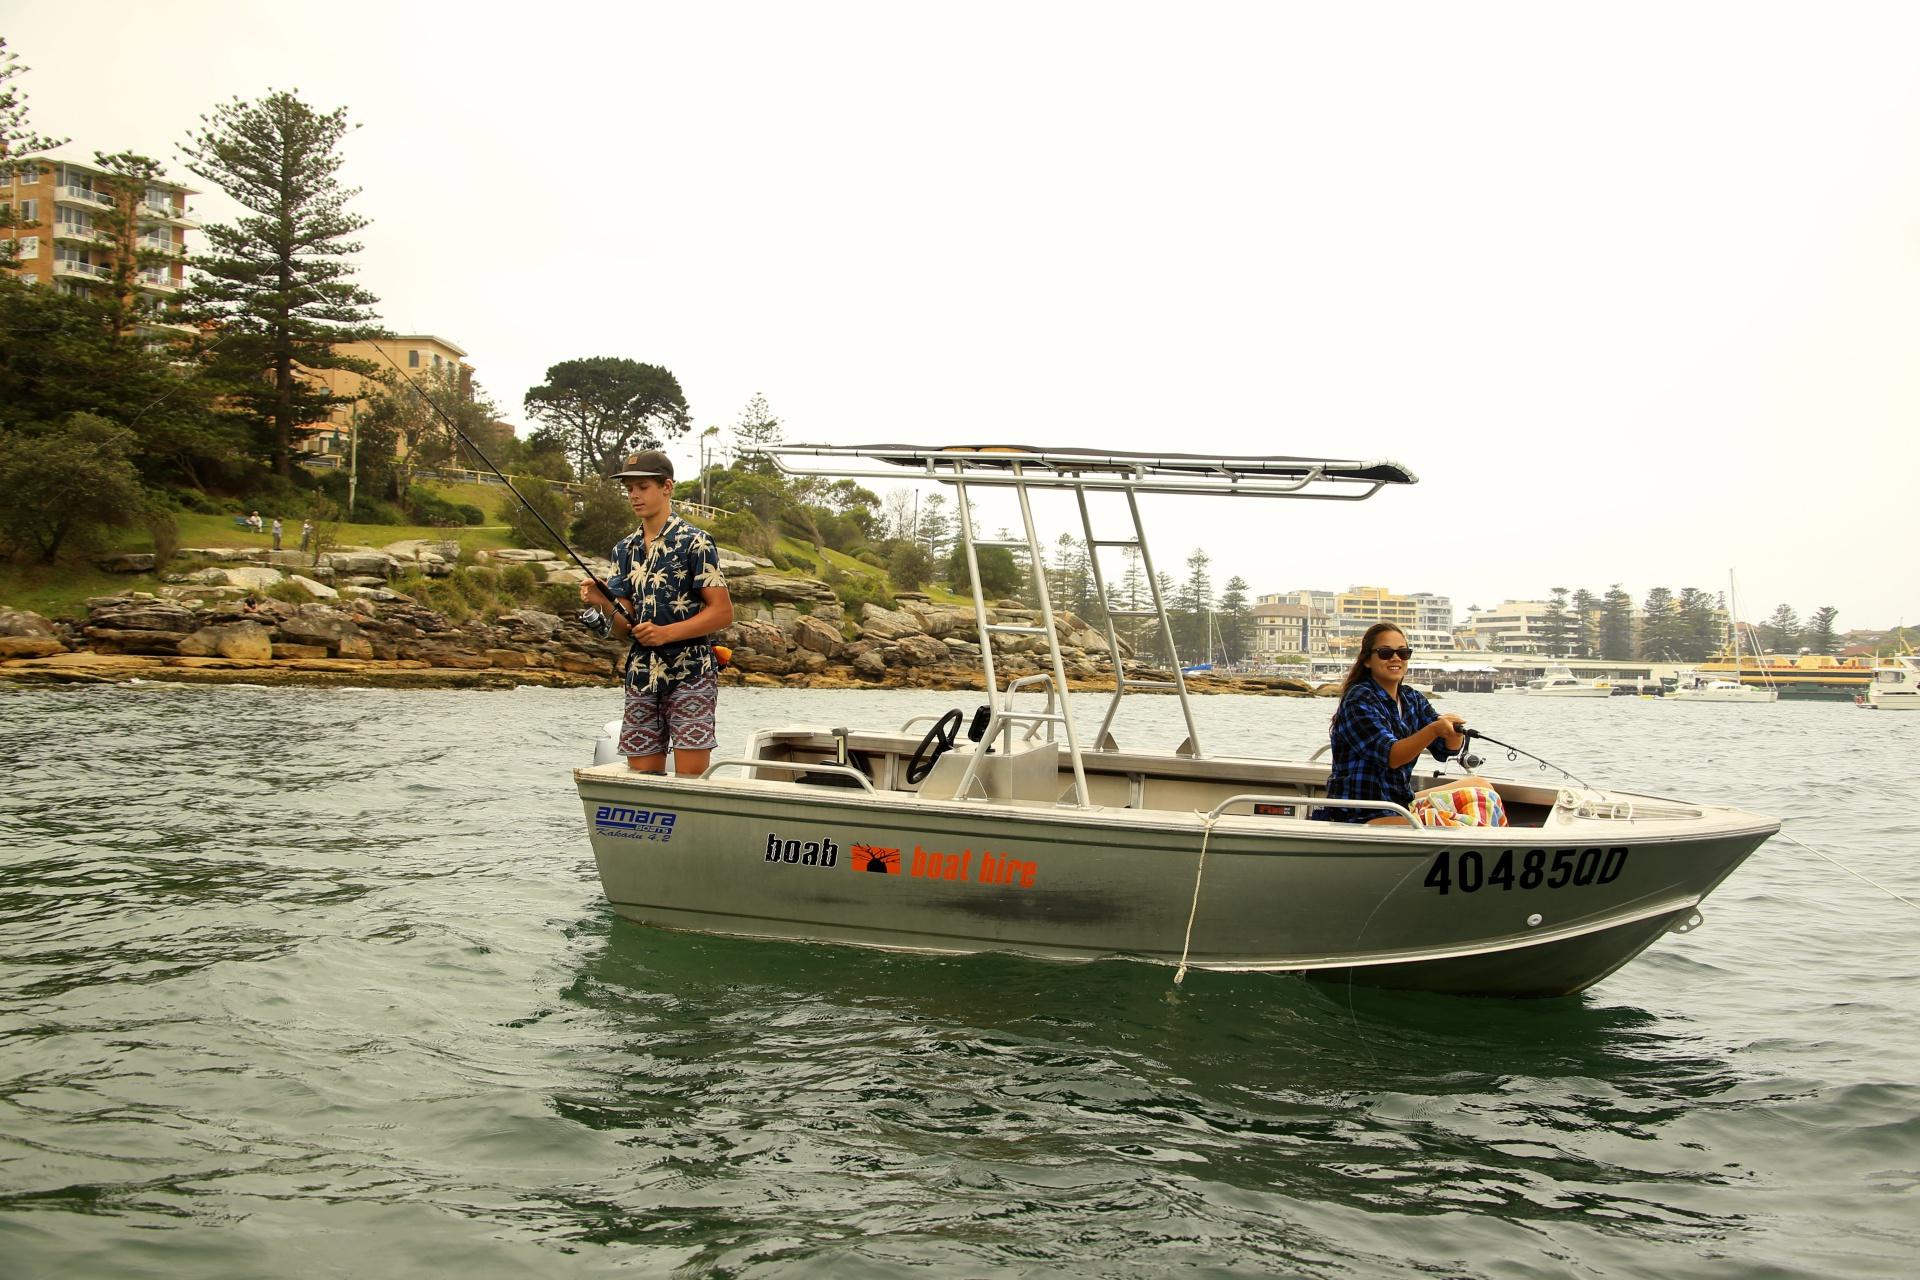 Self-Drive Leisure Boat